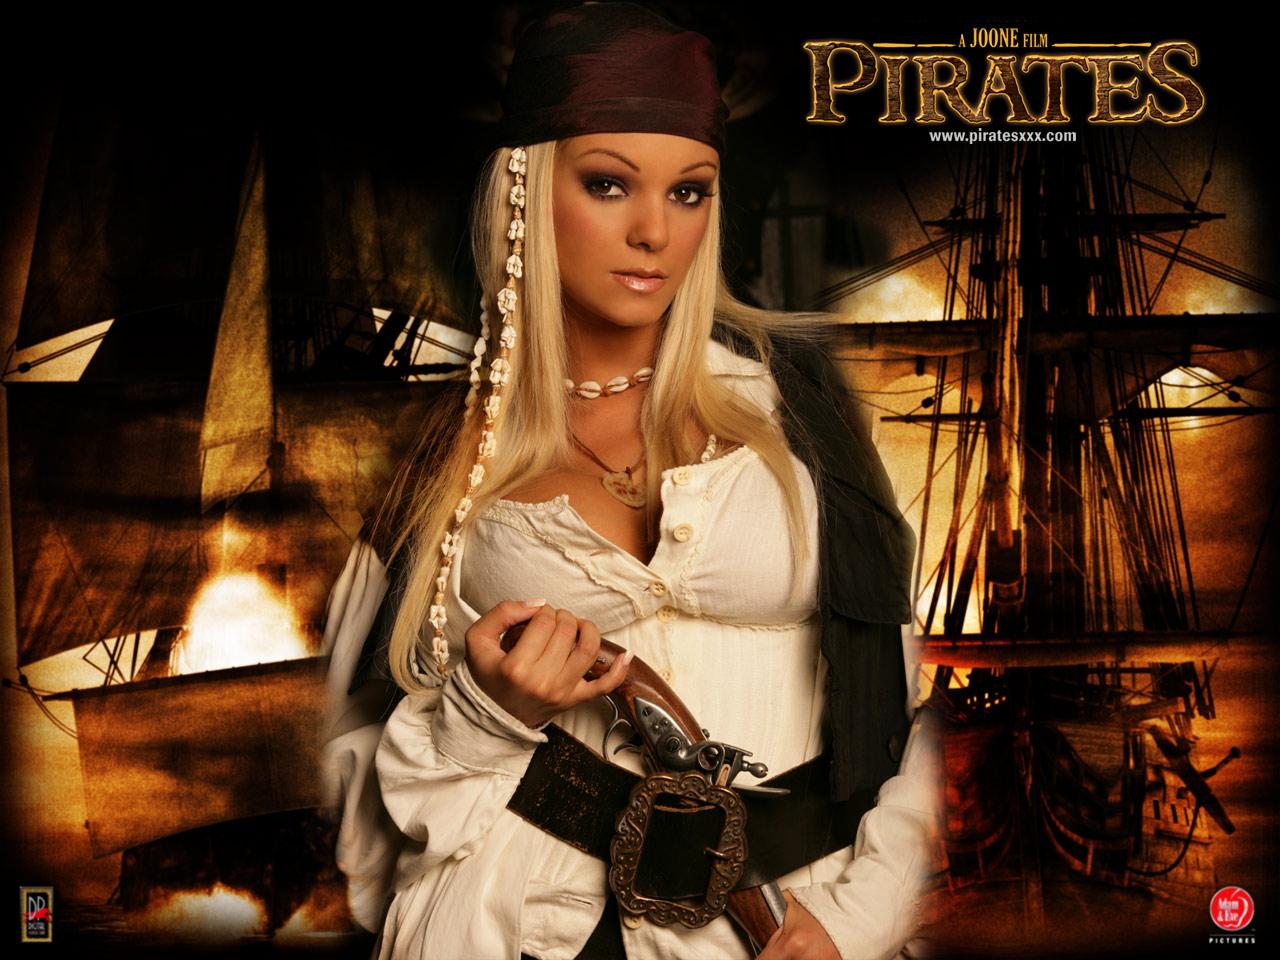 Pirates xx pic hentai gallery